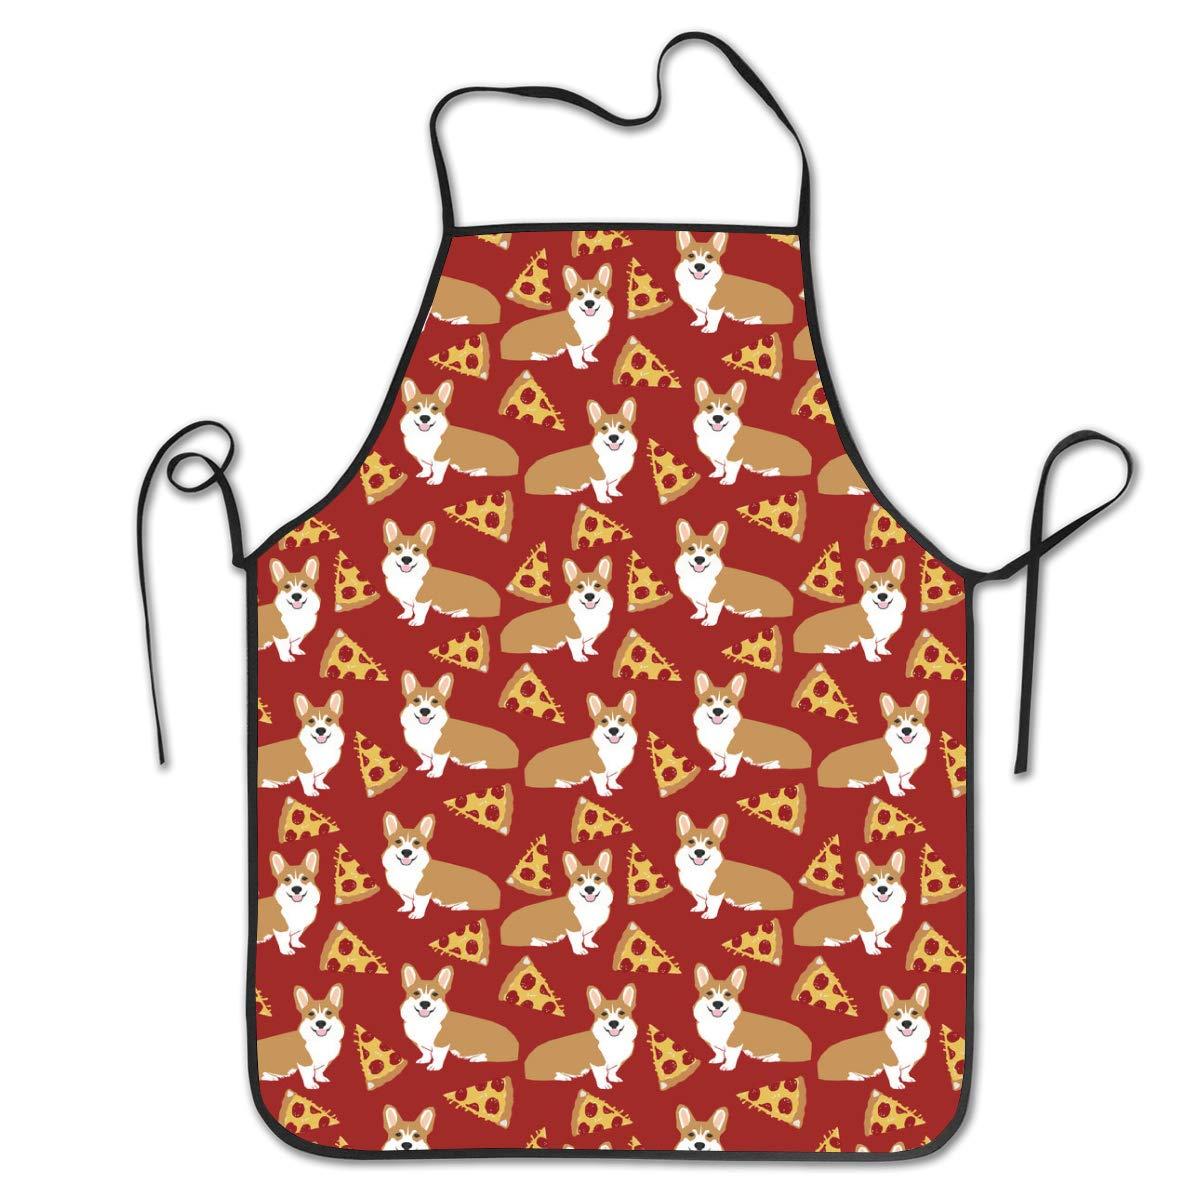 OKAYDECOR Kitchen Apron Corgi Junk Food Cute Dogs PizzasBib Aprons Women Men Professional Chef Aprons with Extra Long Ties/Waterproof Waiter Hostess Apron for Restaurant Baking